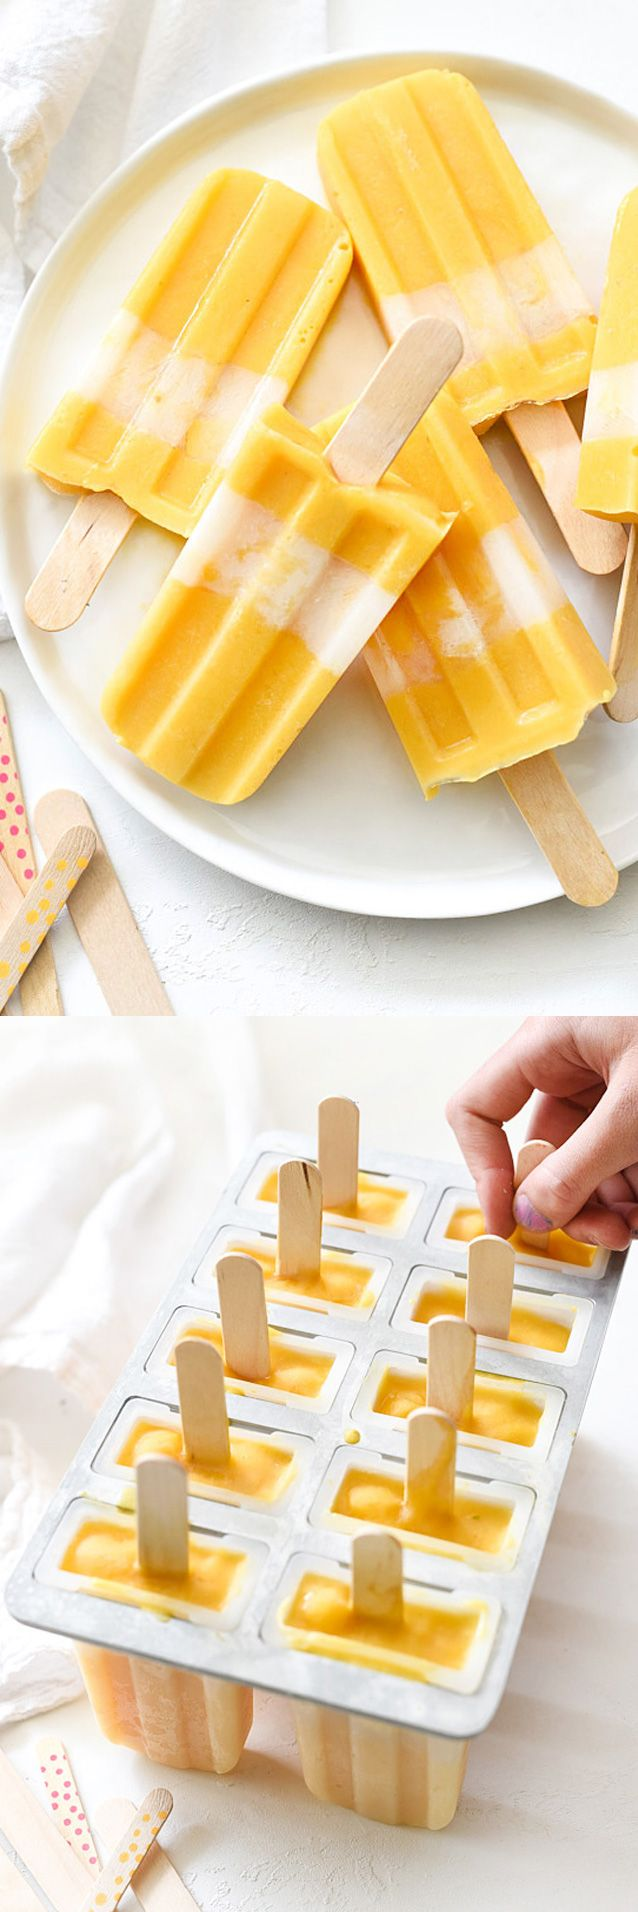 Almond milk and vanilla Greek yogurt make these mango pops ultimately creamy | foodiecrush.com